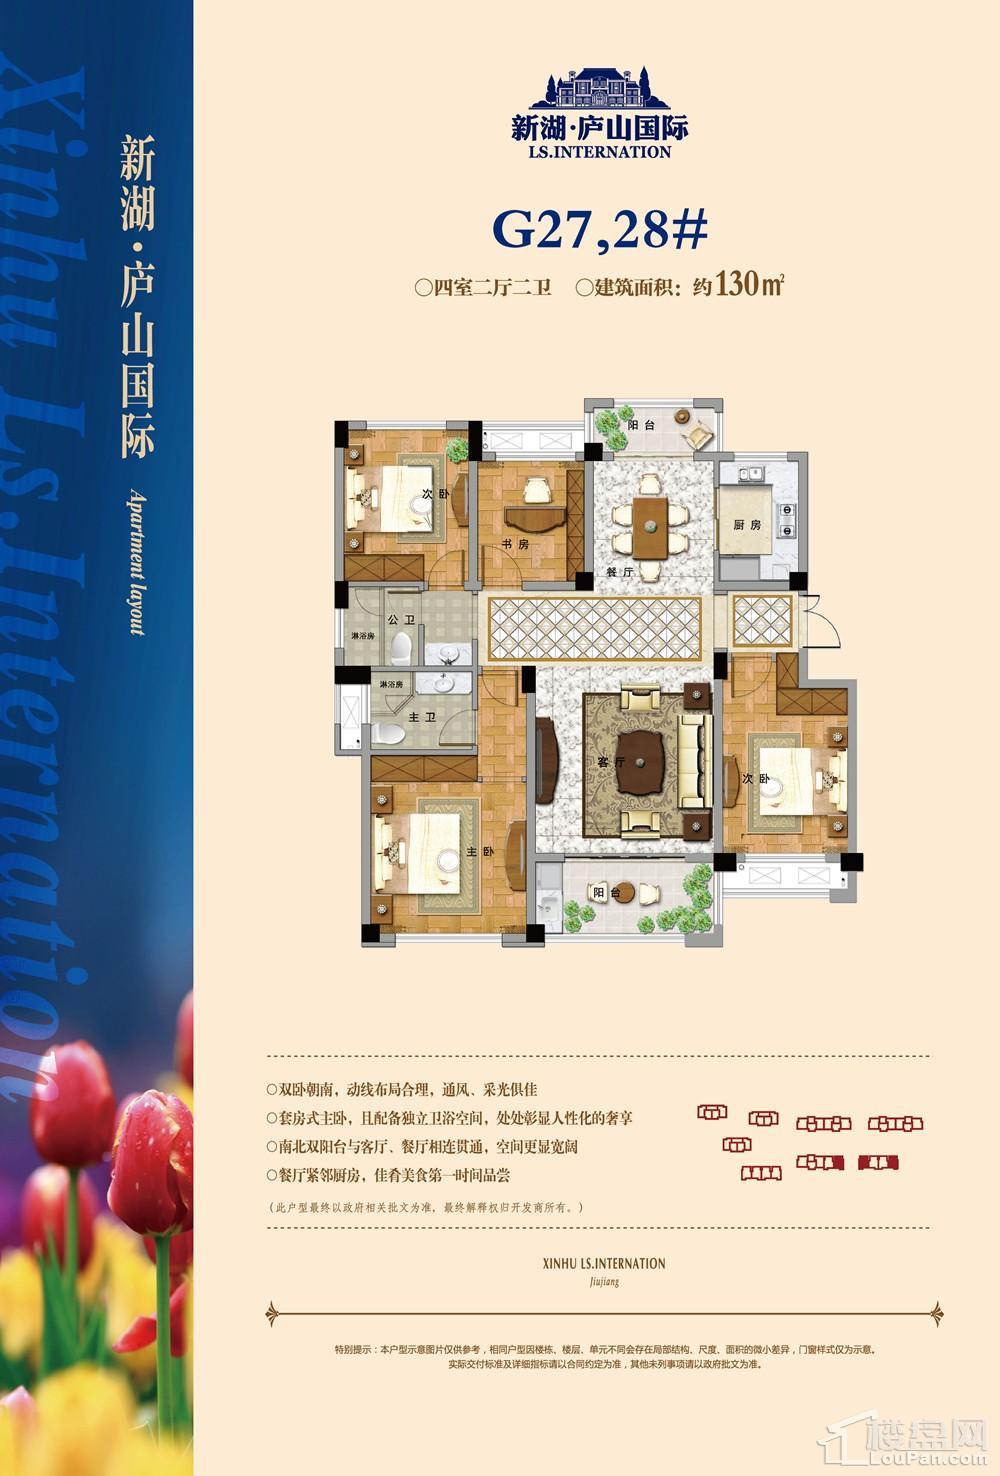 G27,28#楼130平户型